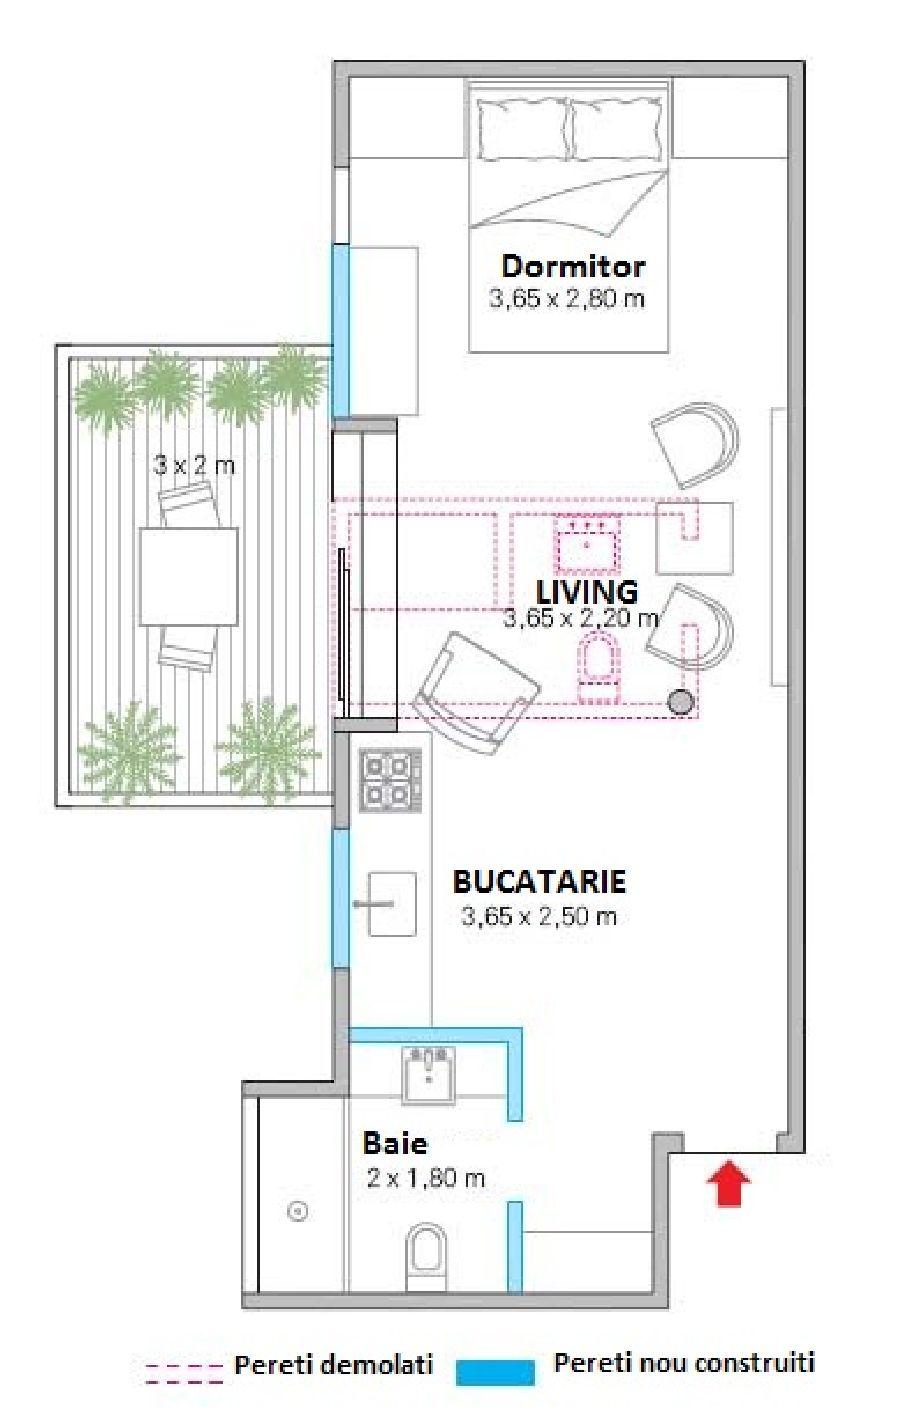 adelaparvu.com despre locuinta 44 mp cu spect de loft, garsoniera, arhitecti Escala Arquitectura, Andre Passini, Foto Juliano Colodeti (11)